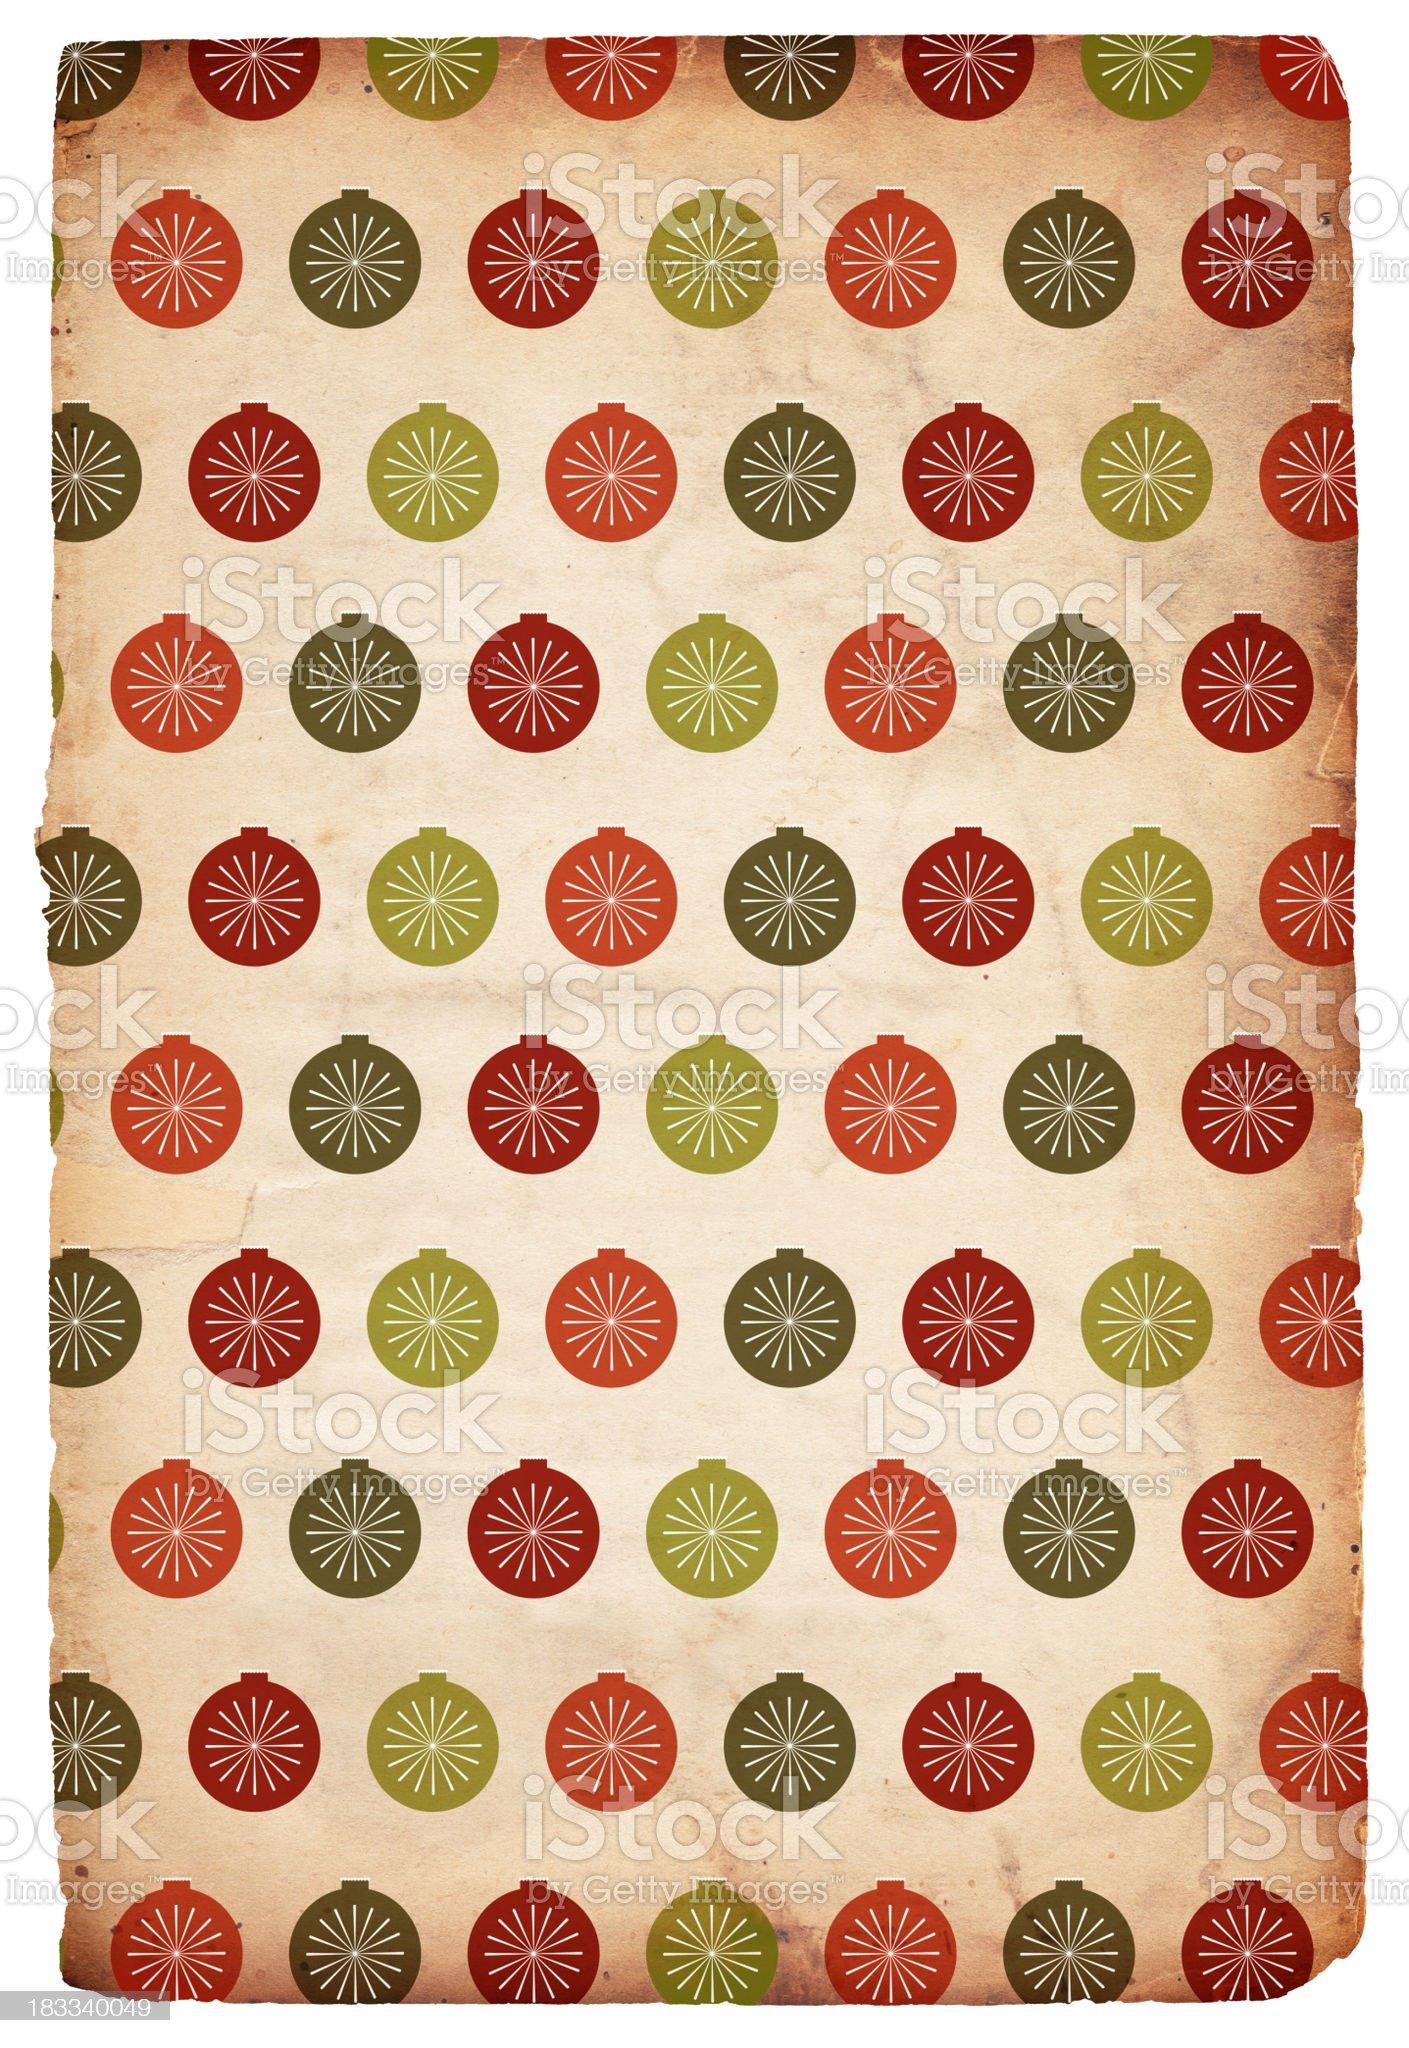 Retro Christmas Paper: Baubles - XXXL royalty-free stock photo